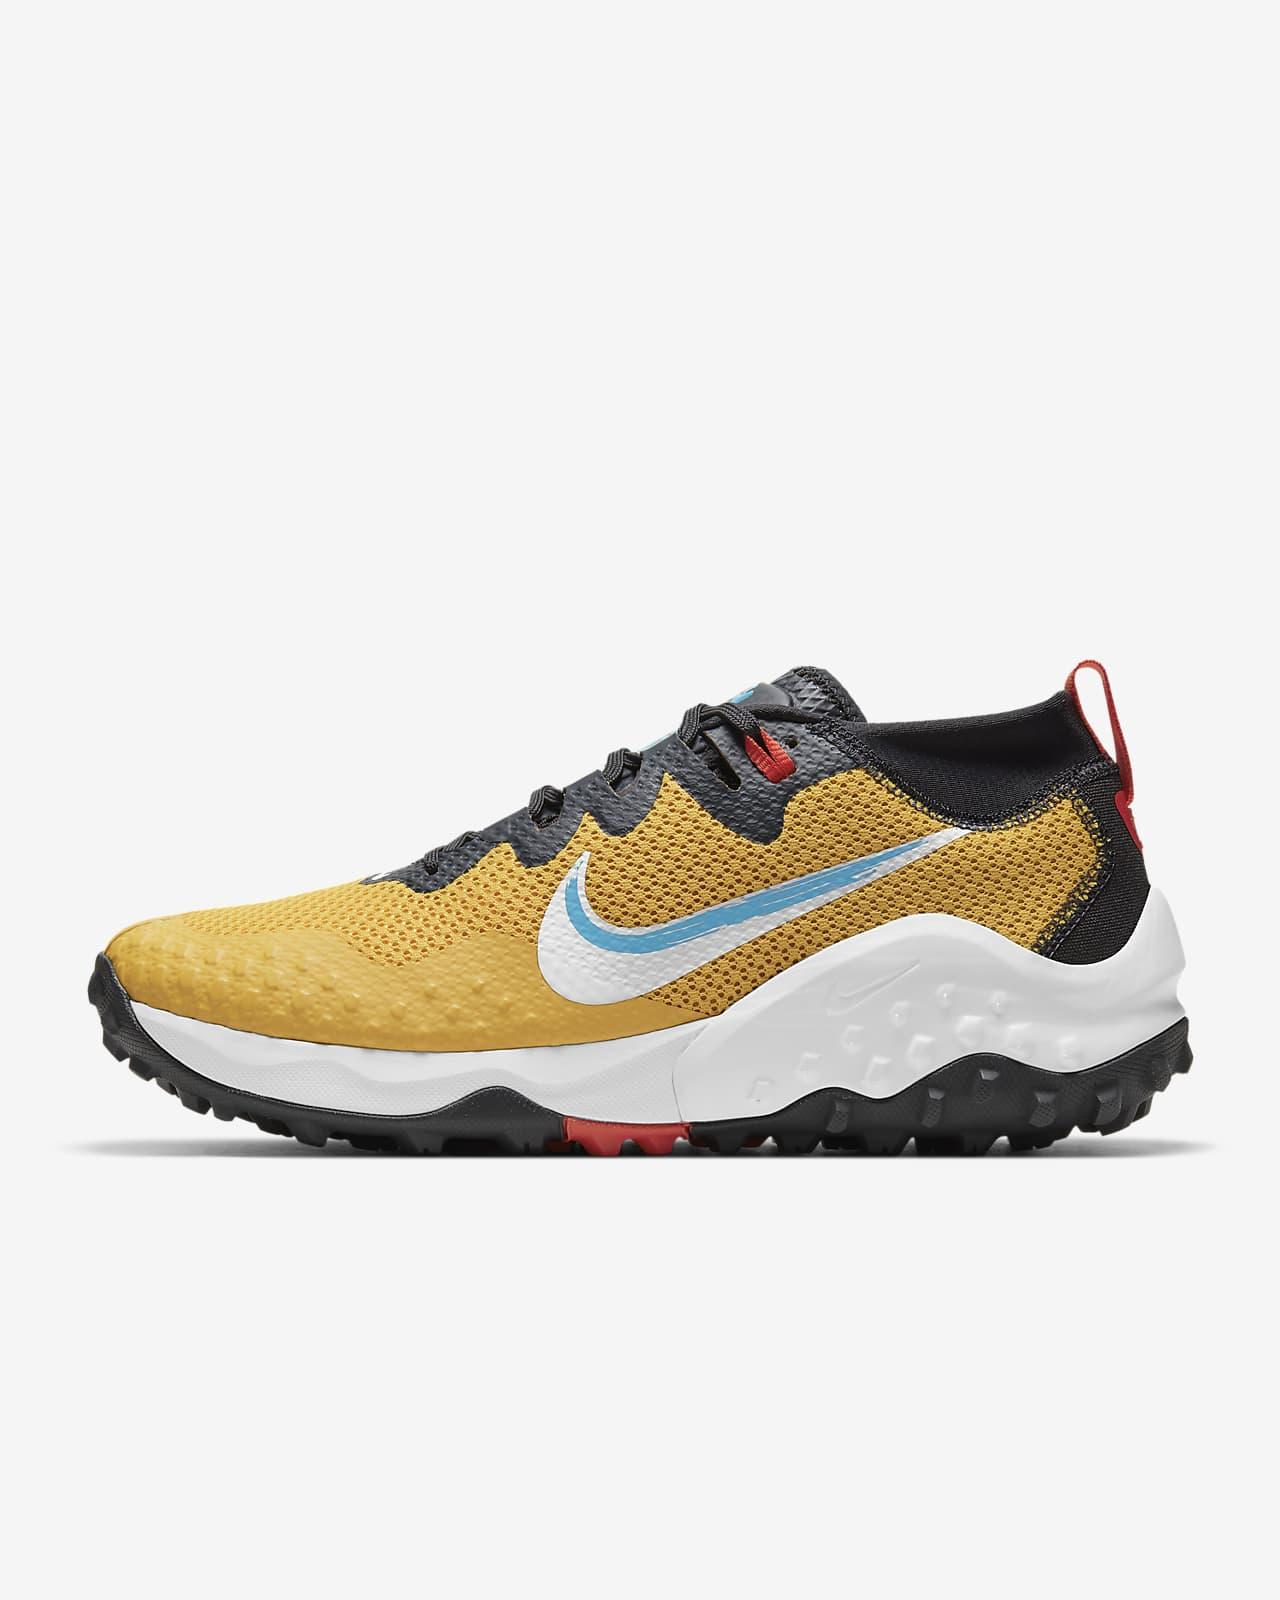 Nike Wildhorse 7 男款越野跑鞋